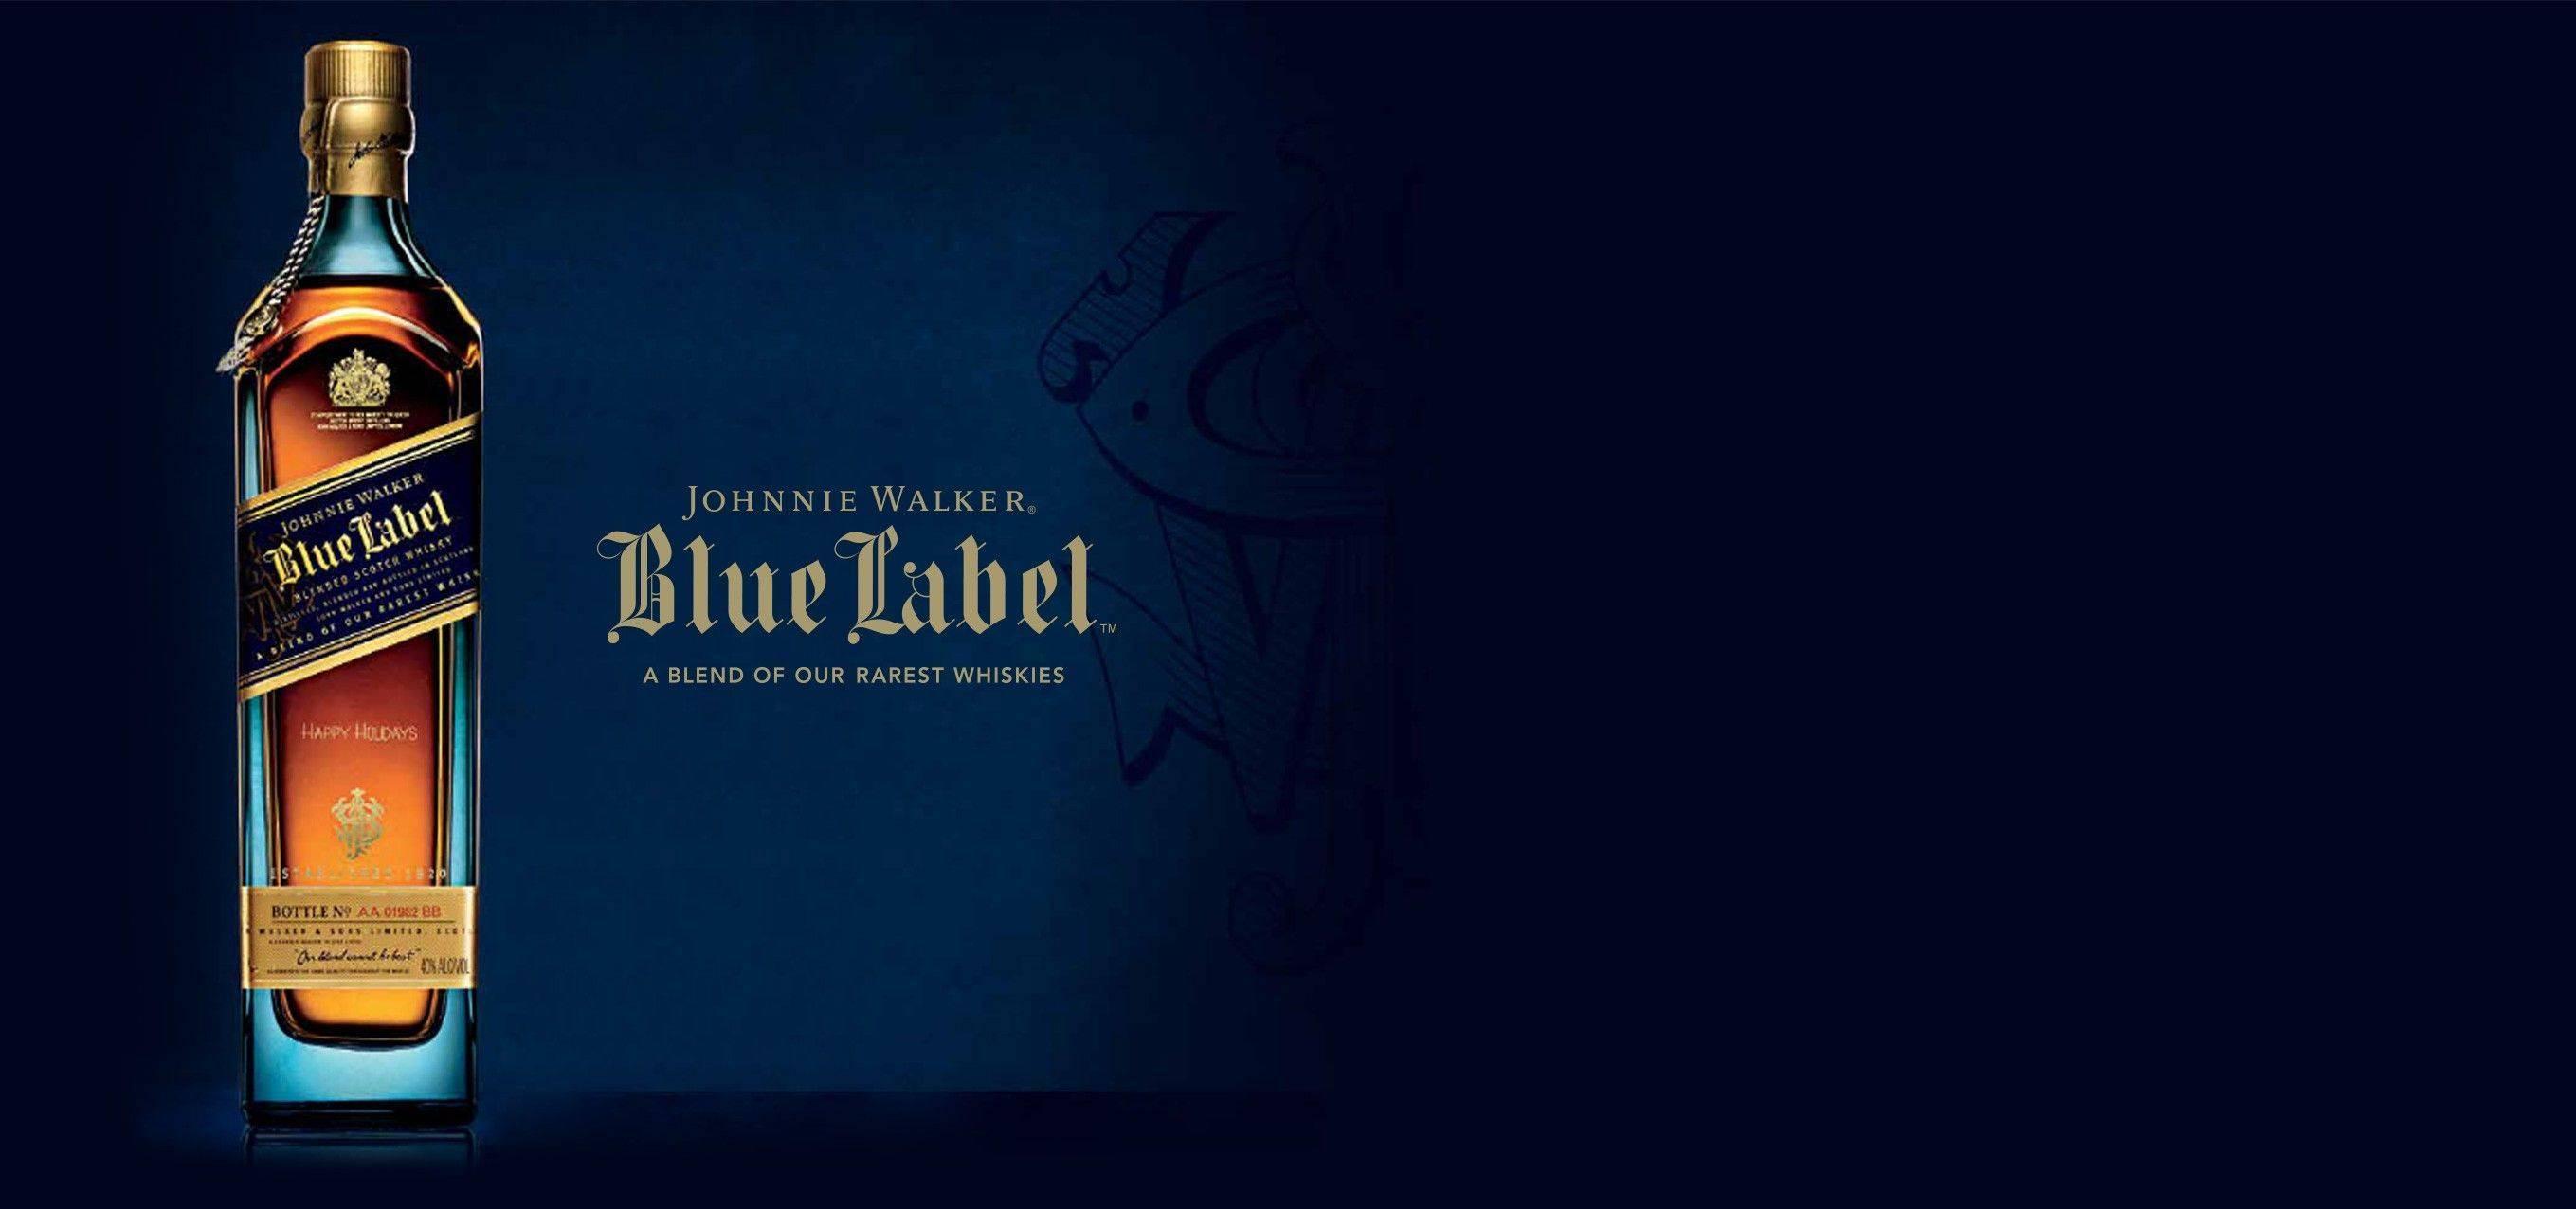 Johnnie walker (джонни уокер)